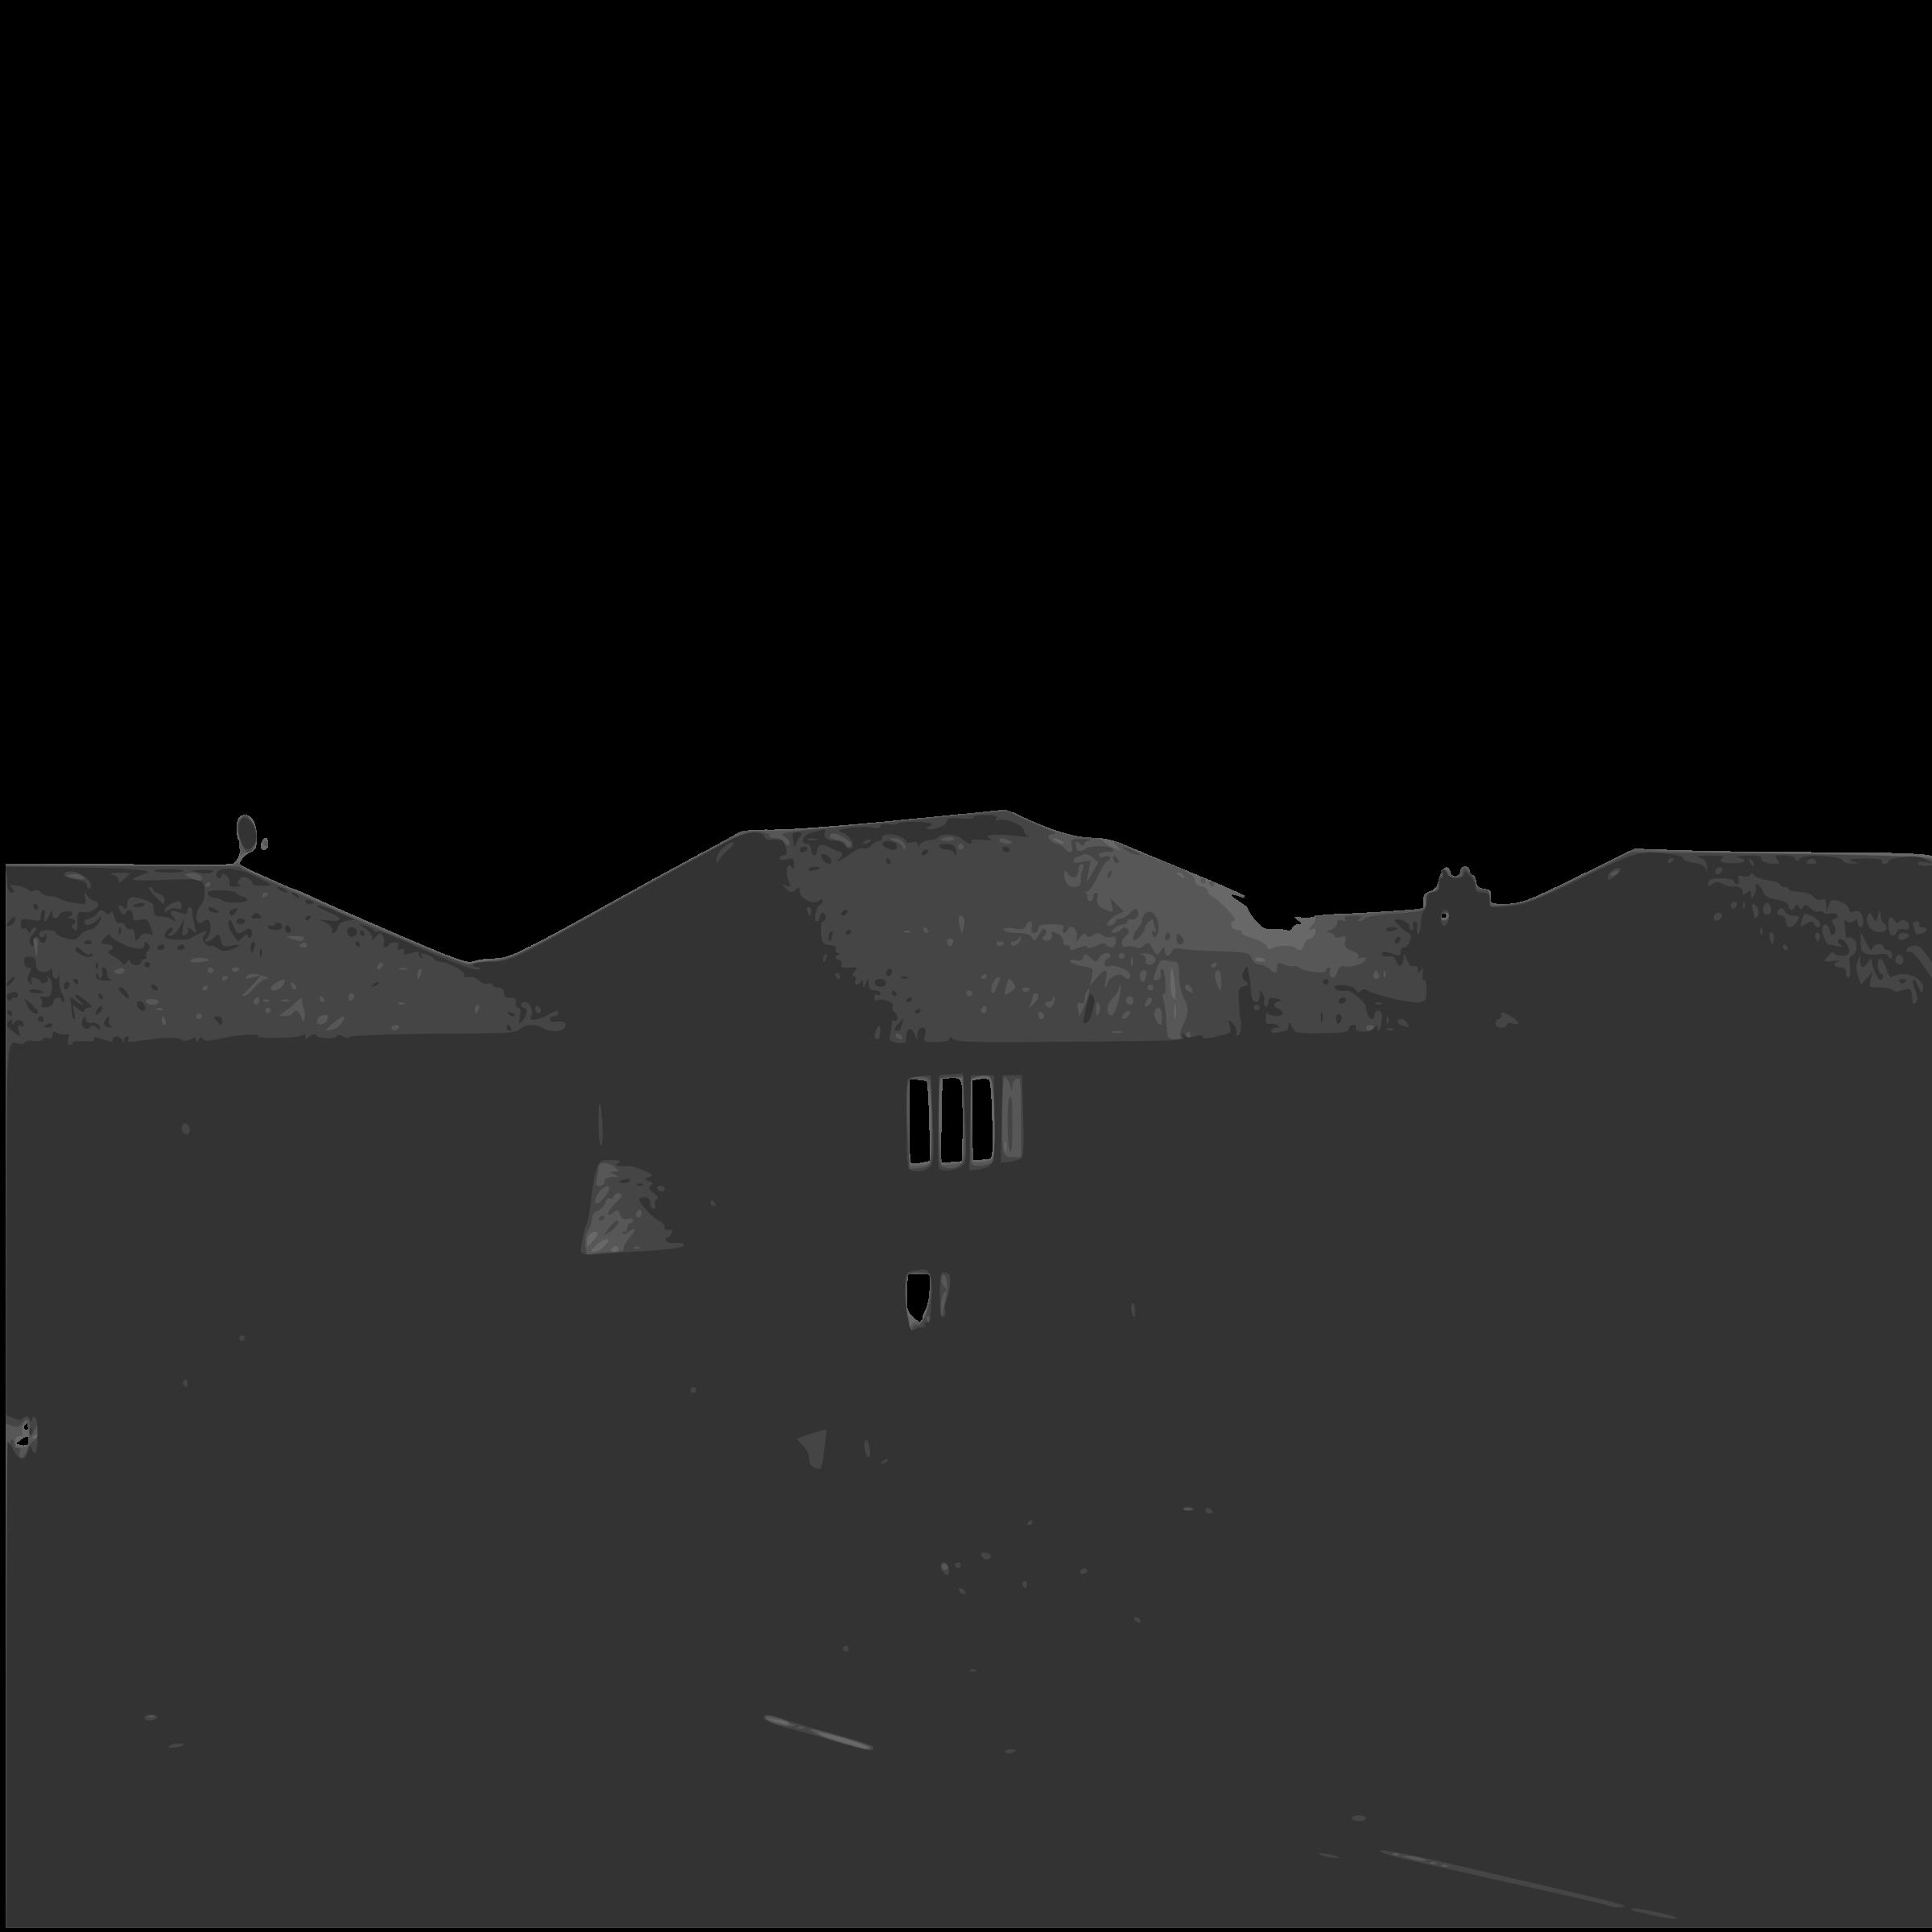 Big image png. Houses clipart landscape